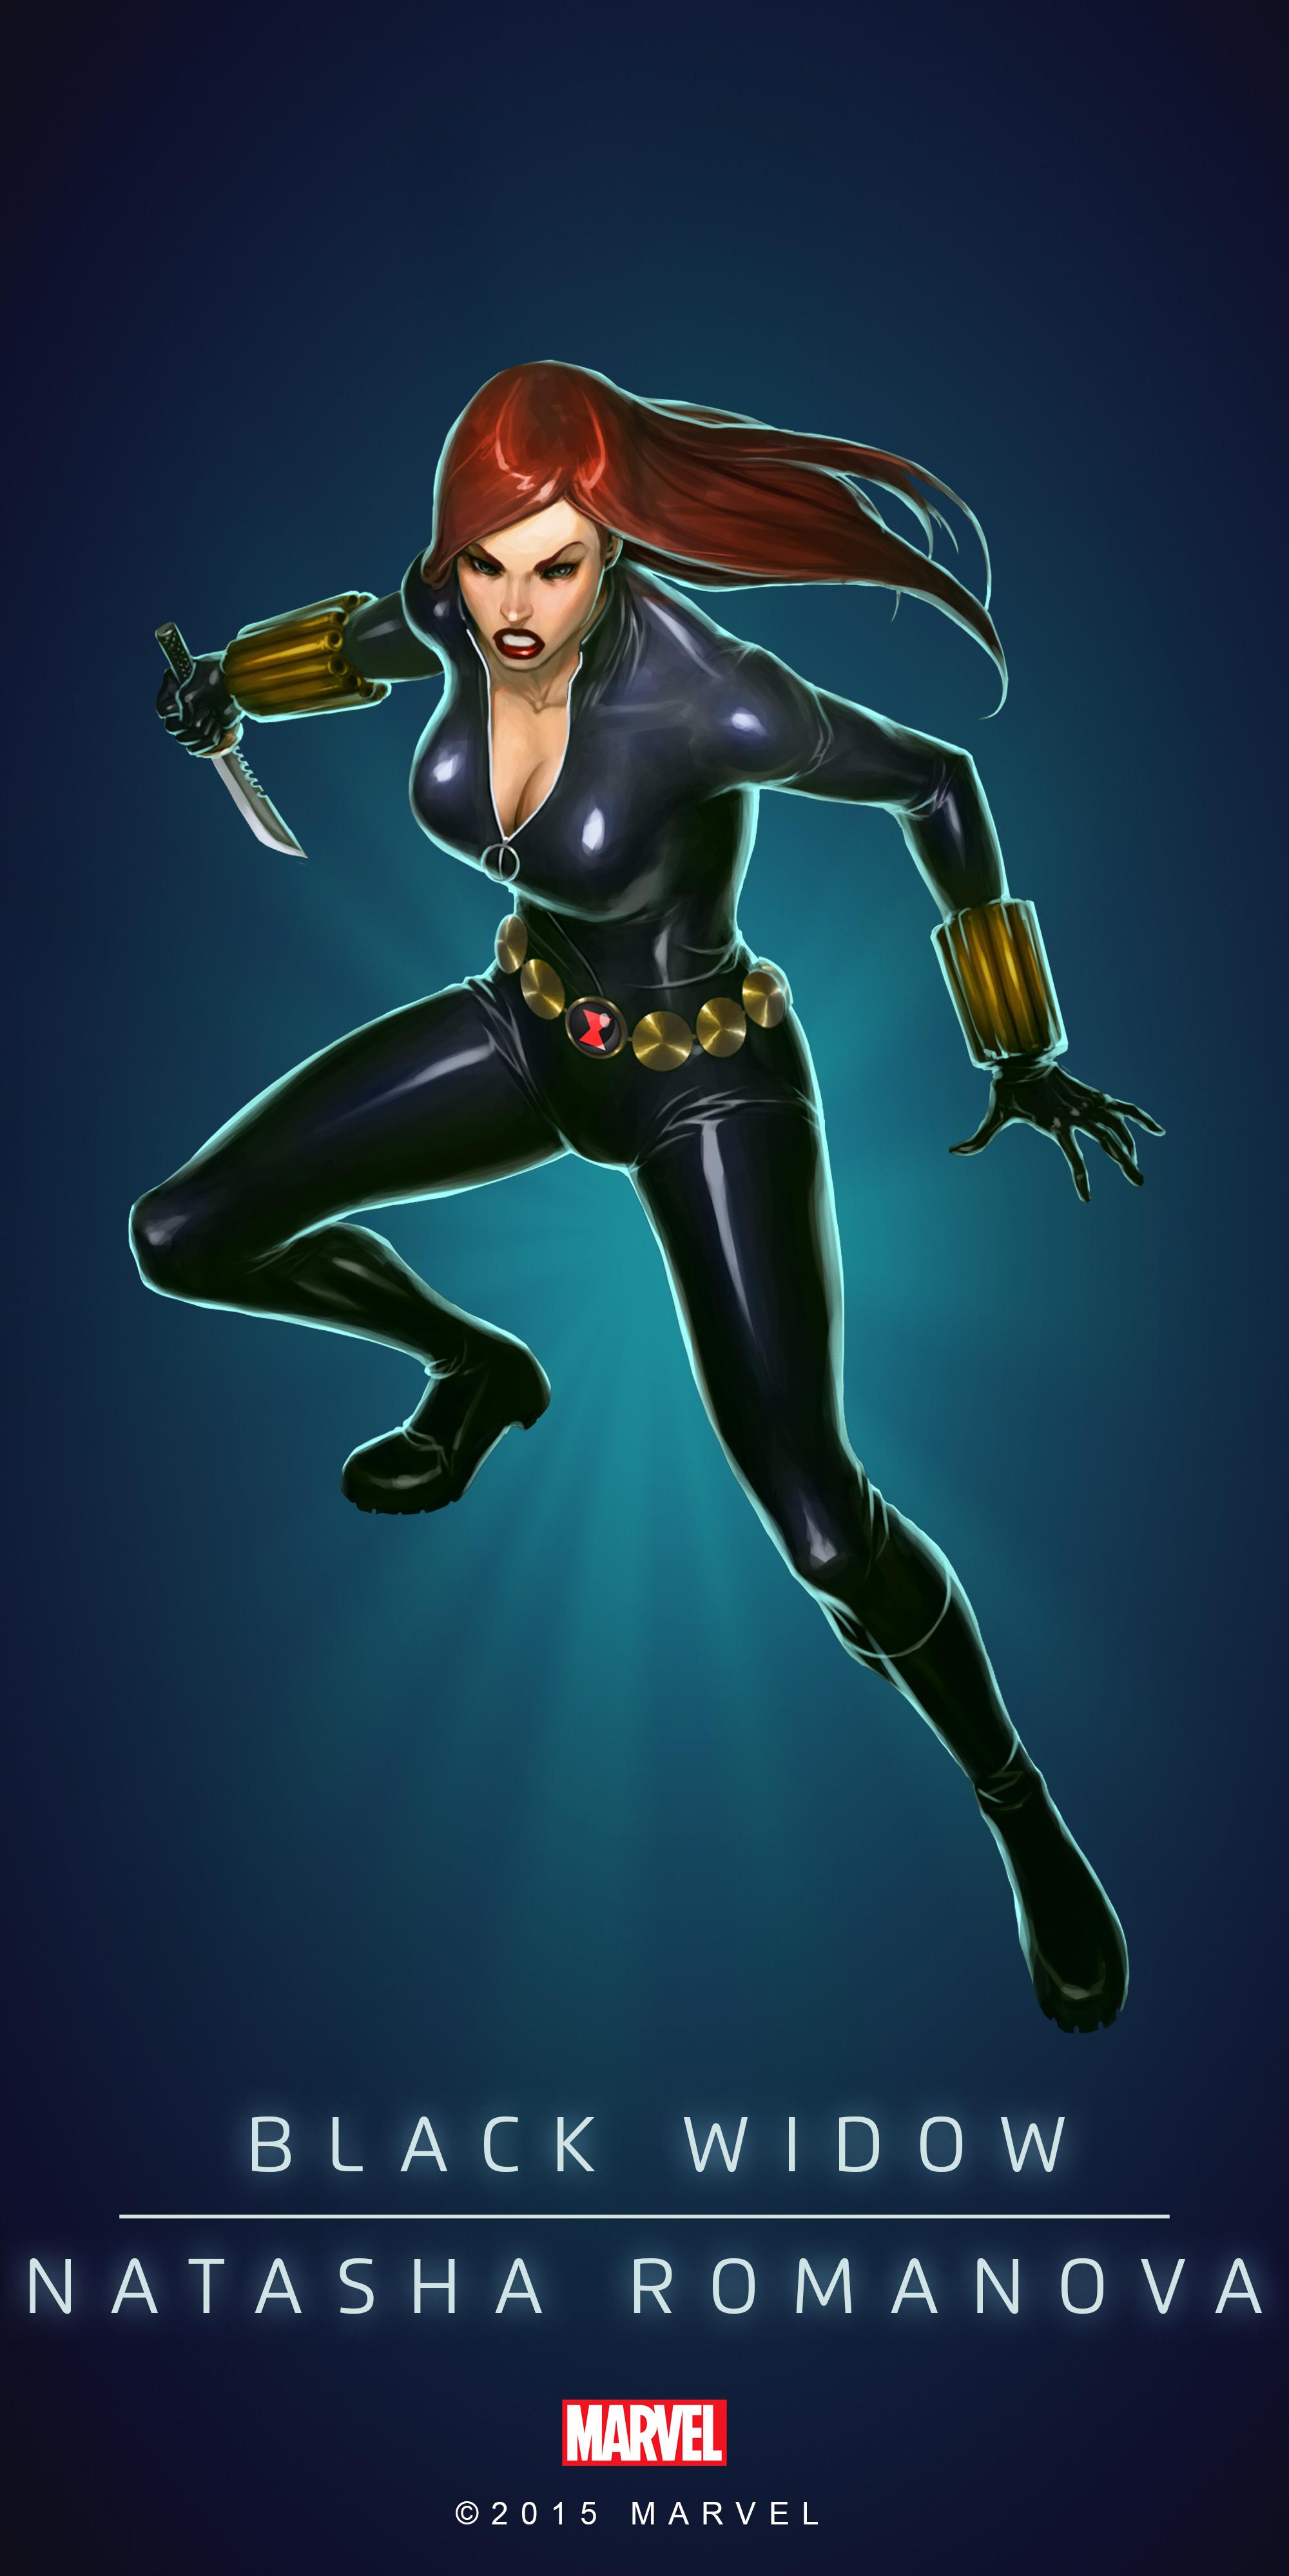 Black Widow Modern Poster 02 Png Png Image 2000 3997 Pixels Marvel Comic Character Marvel Comics Art Marvel Superheroes